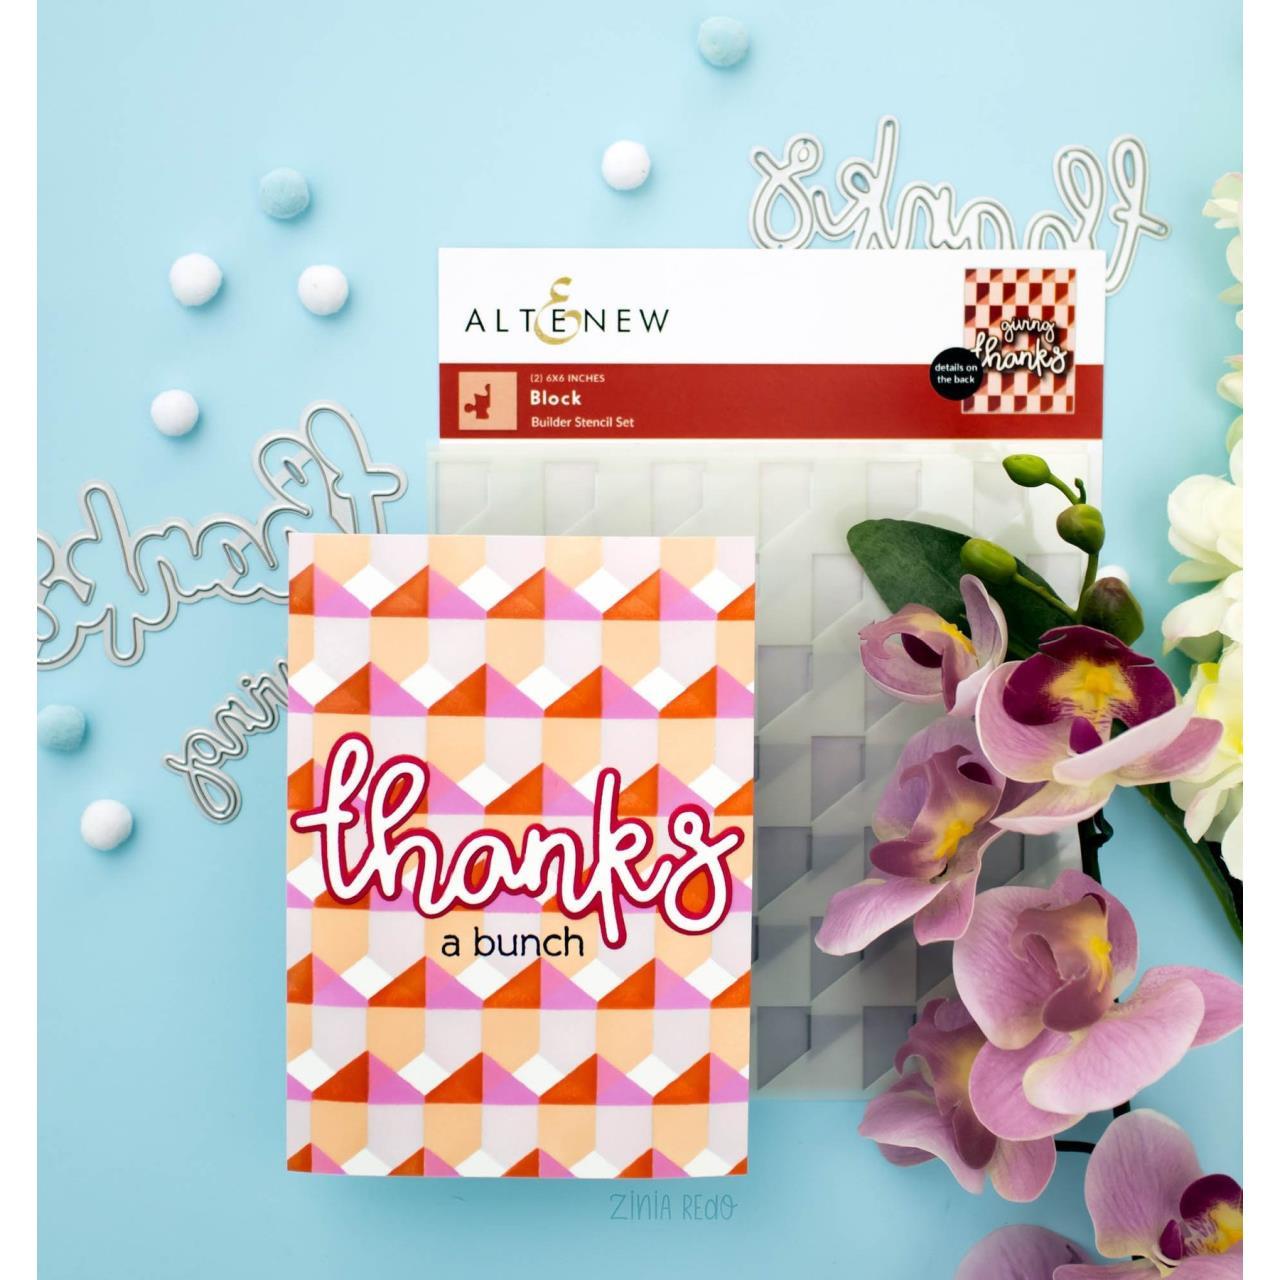 All About Thanks Word, Altenew Dies -